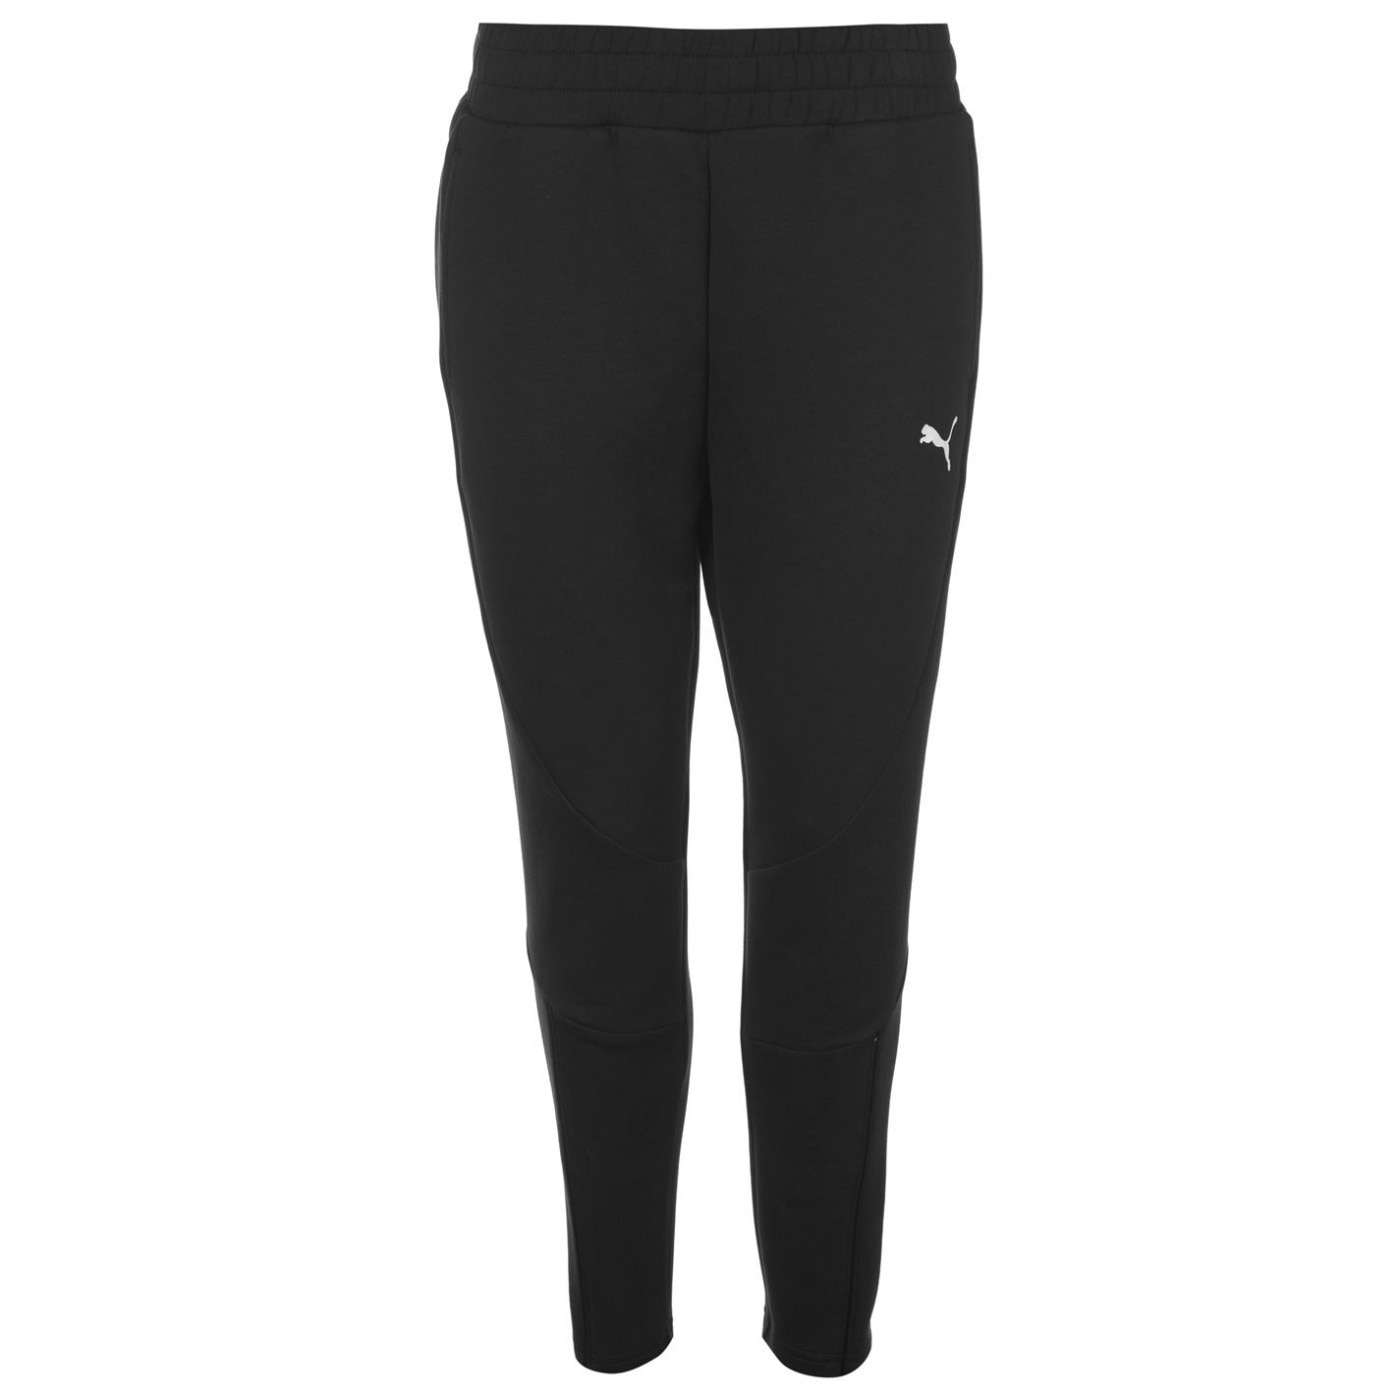 Puma Evo Move Jogging Bottoms Ladies